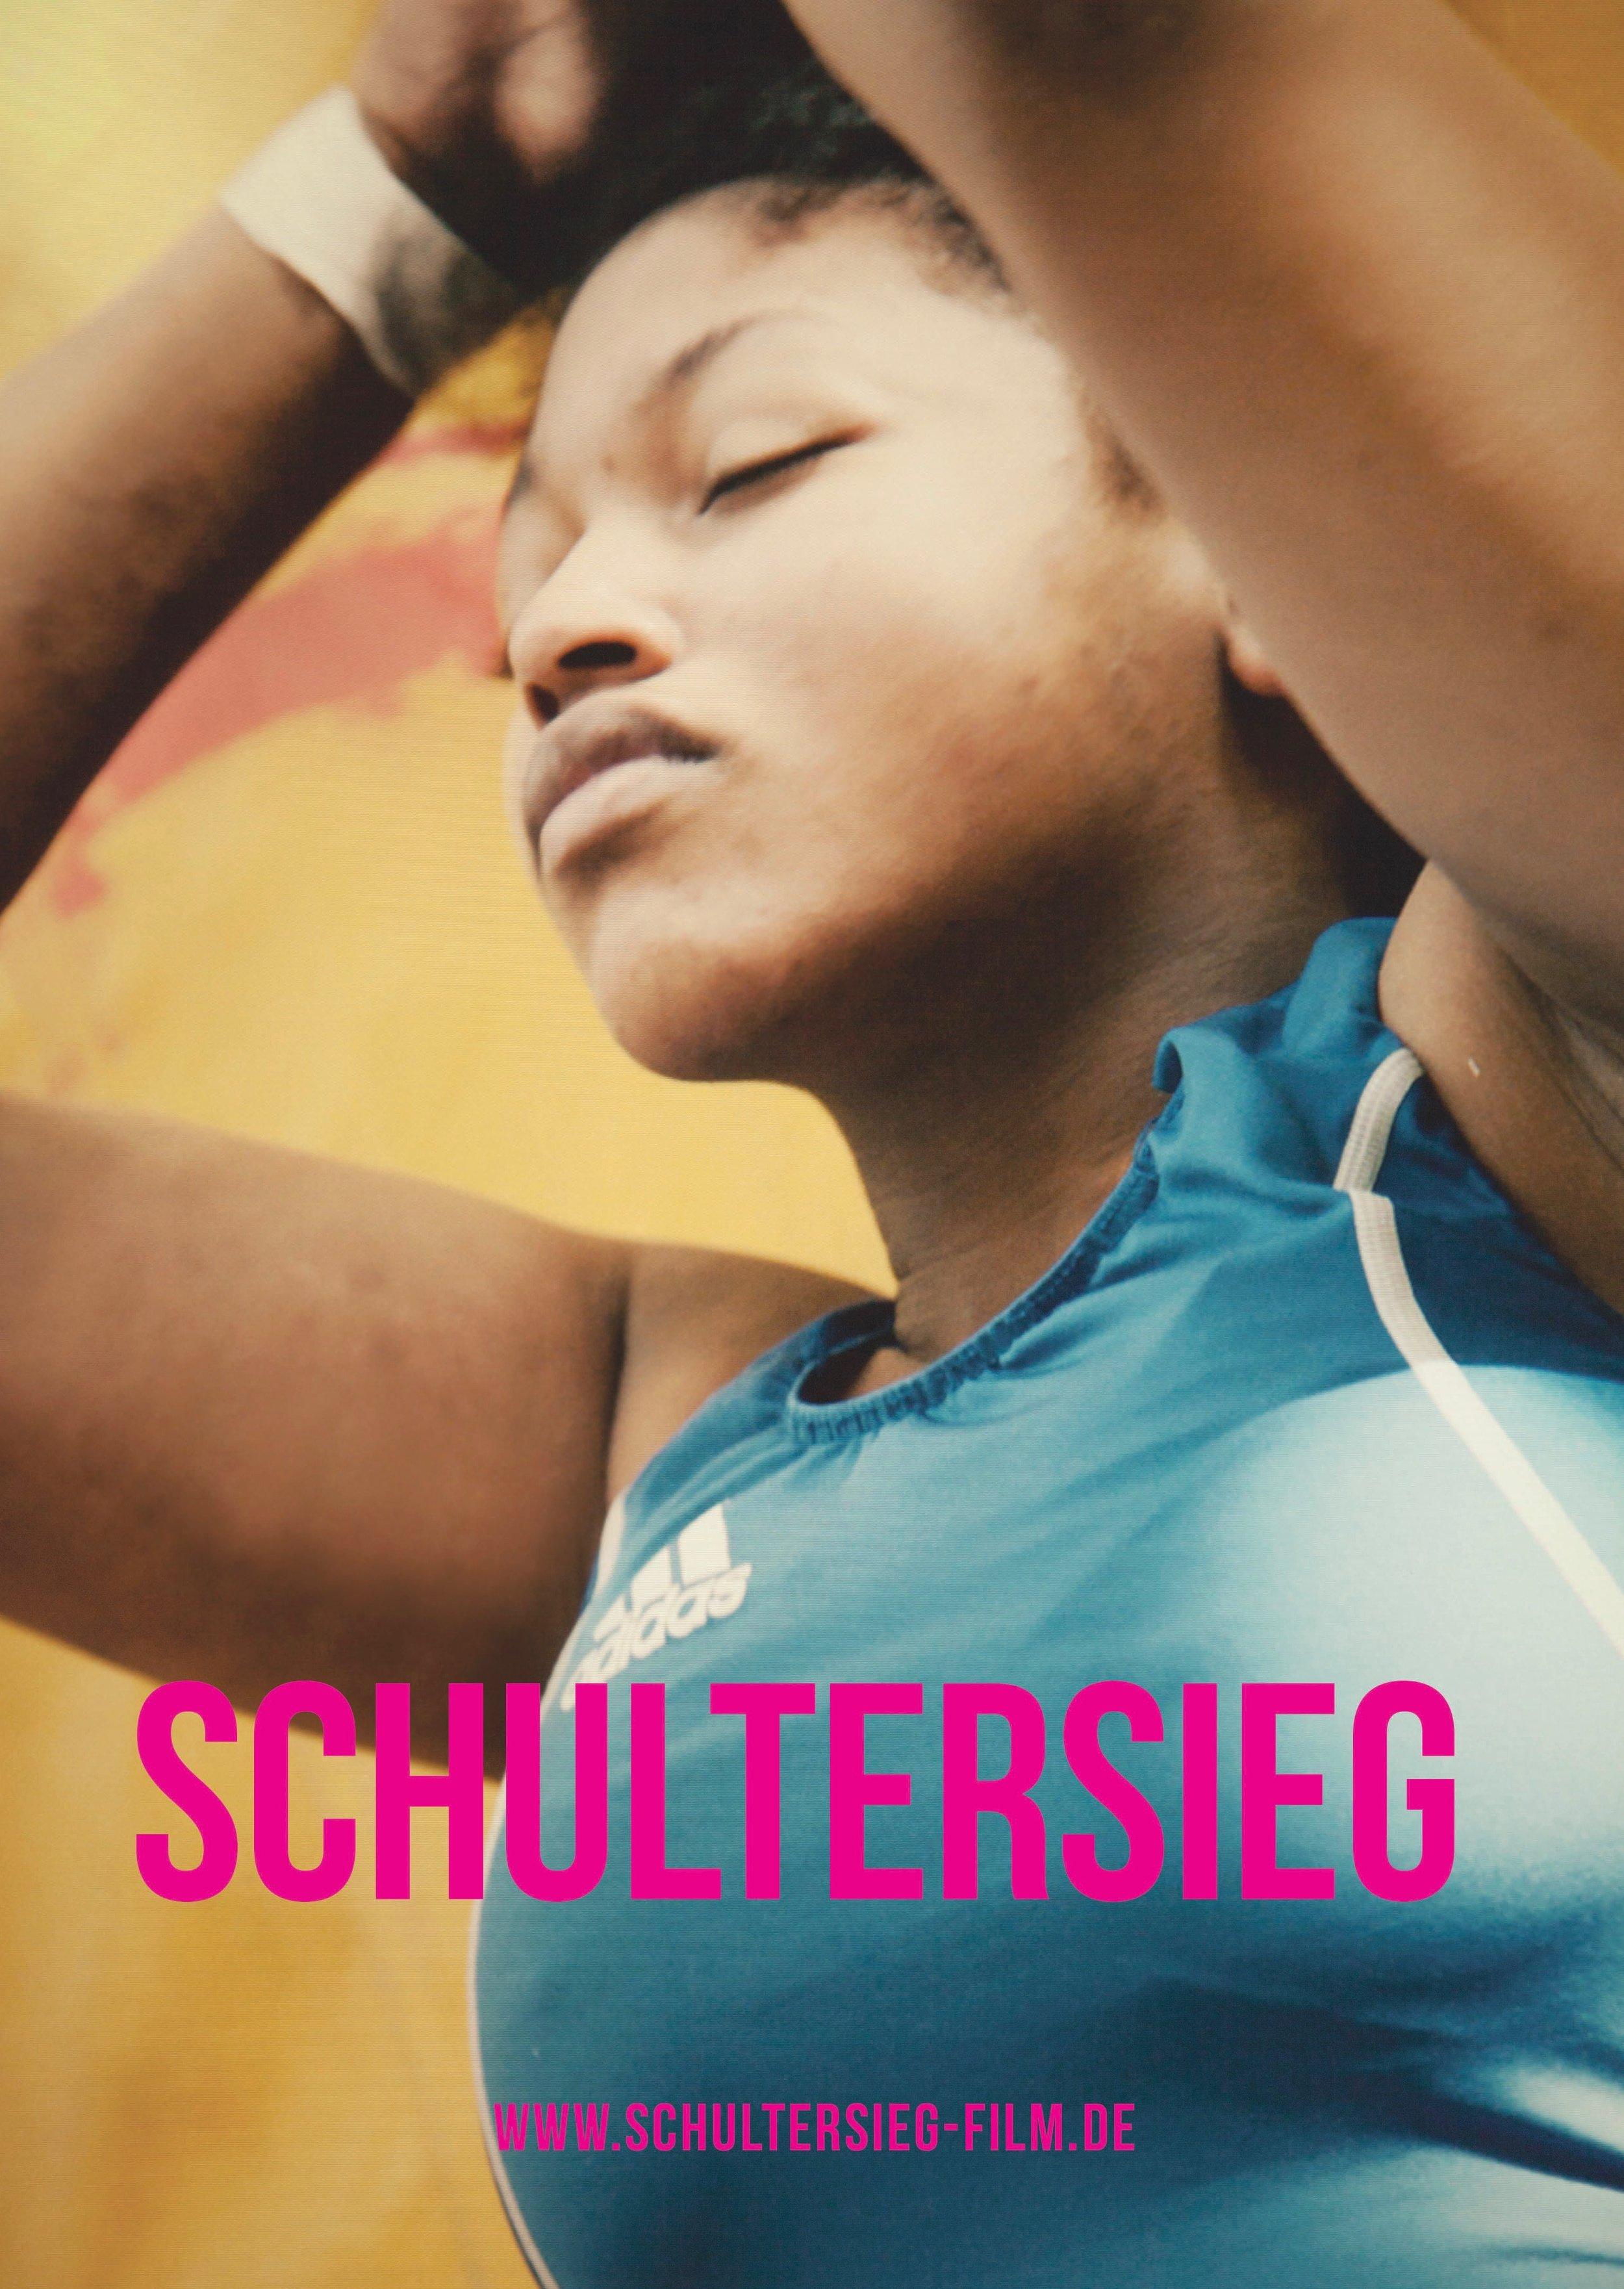 160922_Schultersieg_DVDCover.jpg